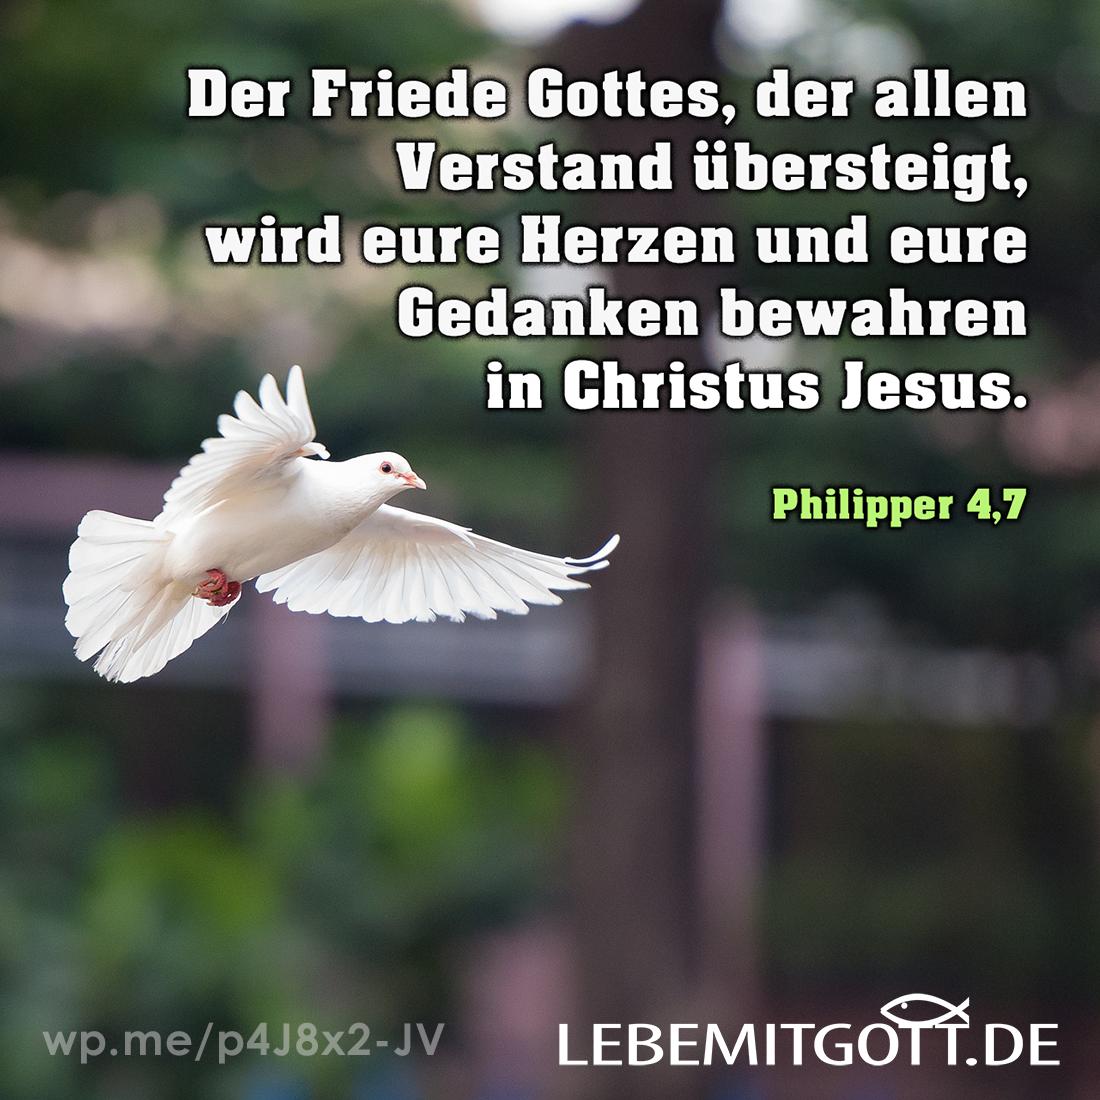 Friede Gottes